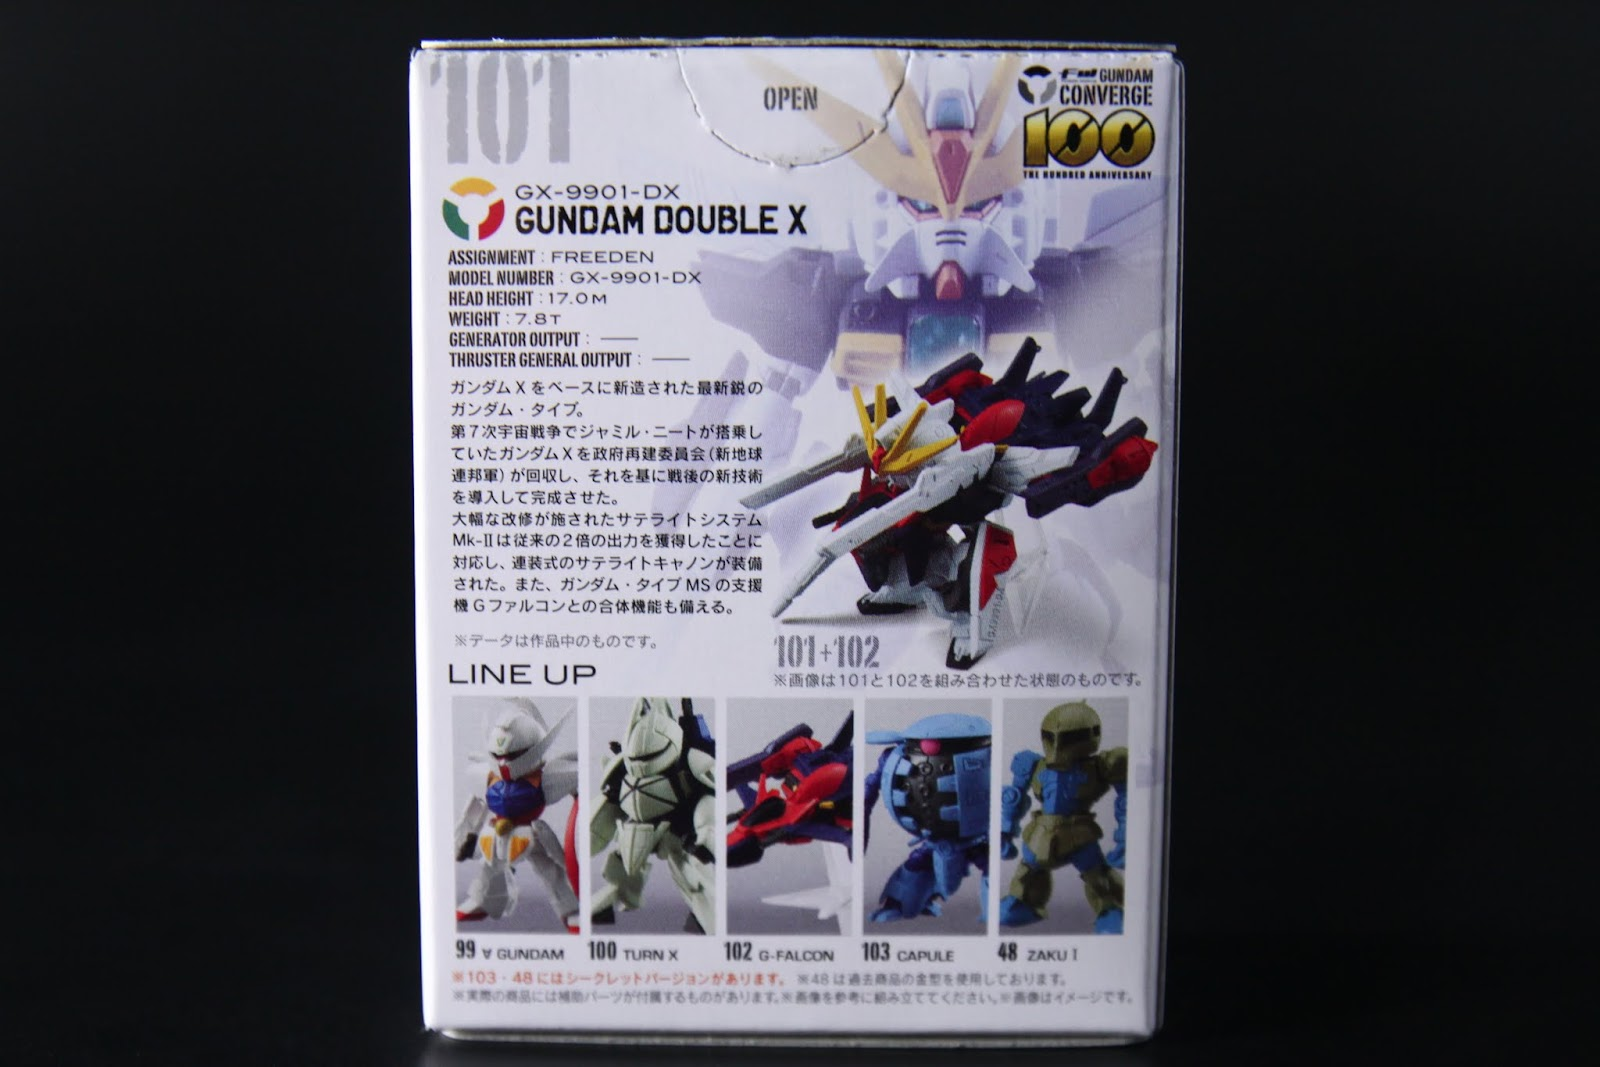 X GUNDAM的後繼機,基本上原作中是第七次宇宙戰爭中遺留下來的兩台X GUNDAM其中一台加以改造成的